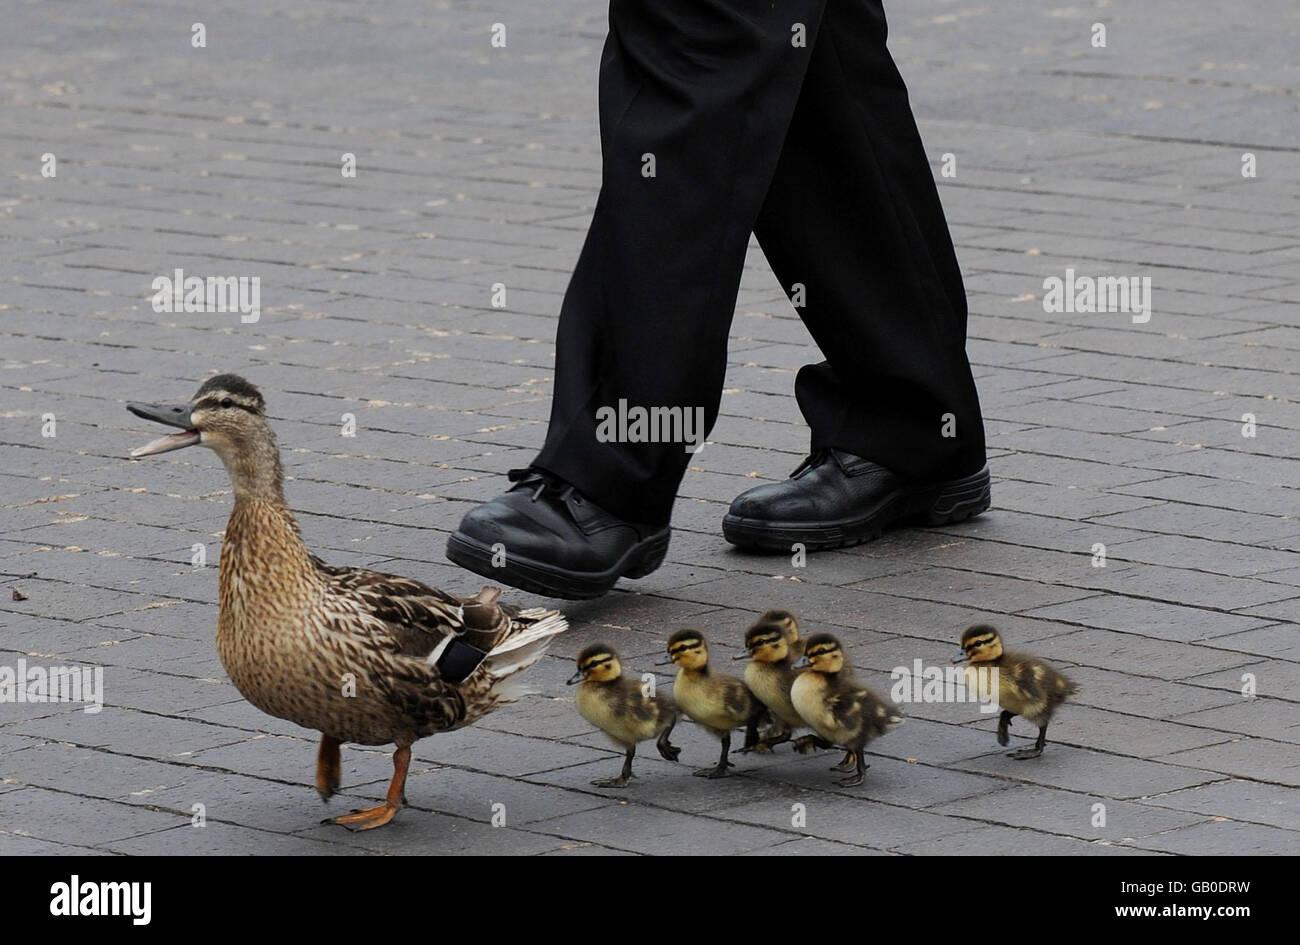 Duck and ducklings in Teeside - Stock Image